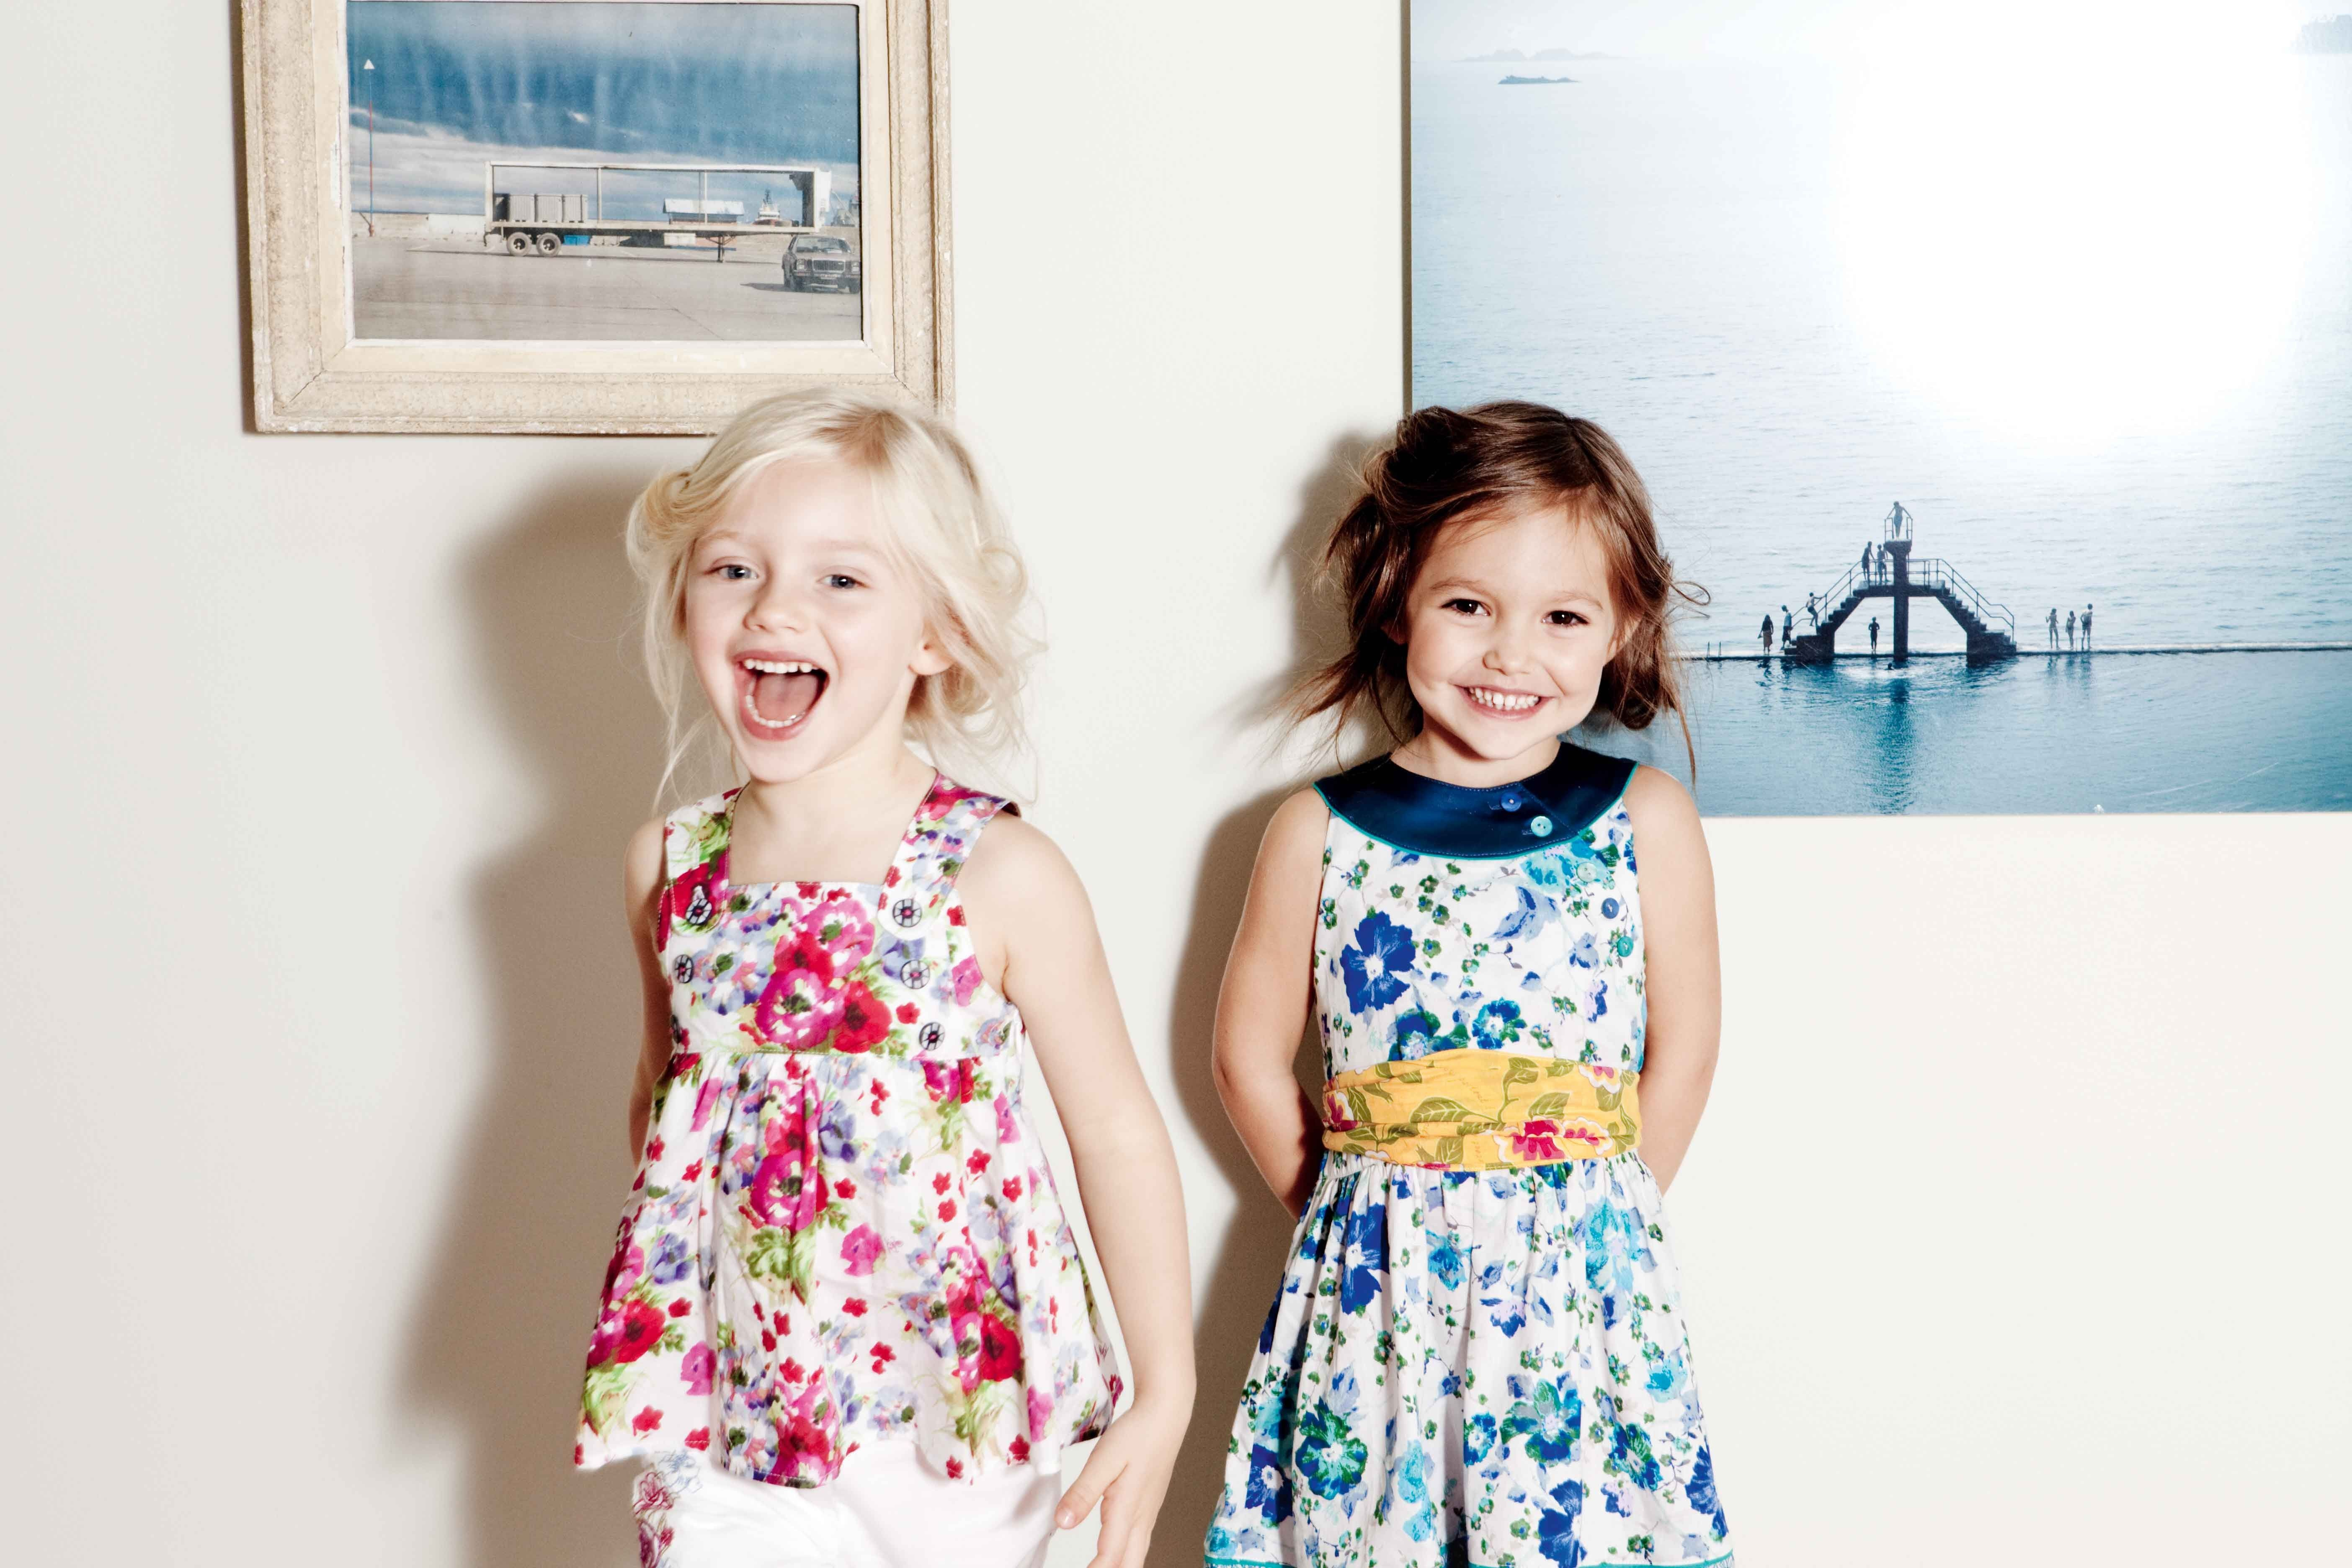 kenzo kids ss11 15 5616—3744 Children Pinterest